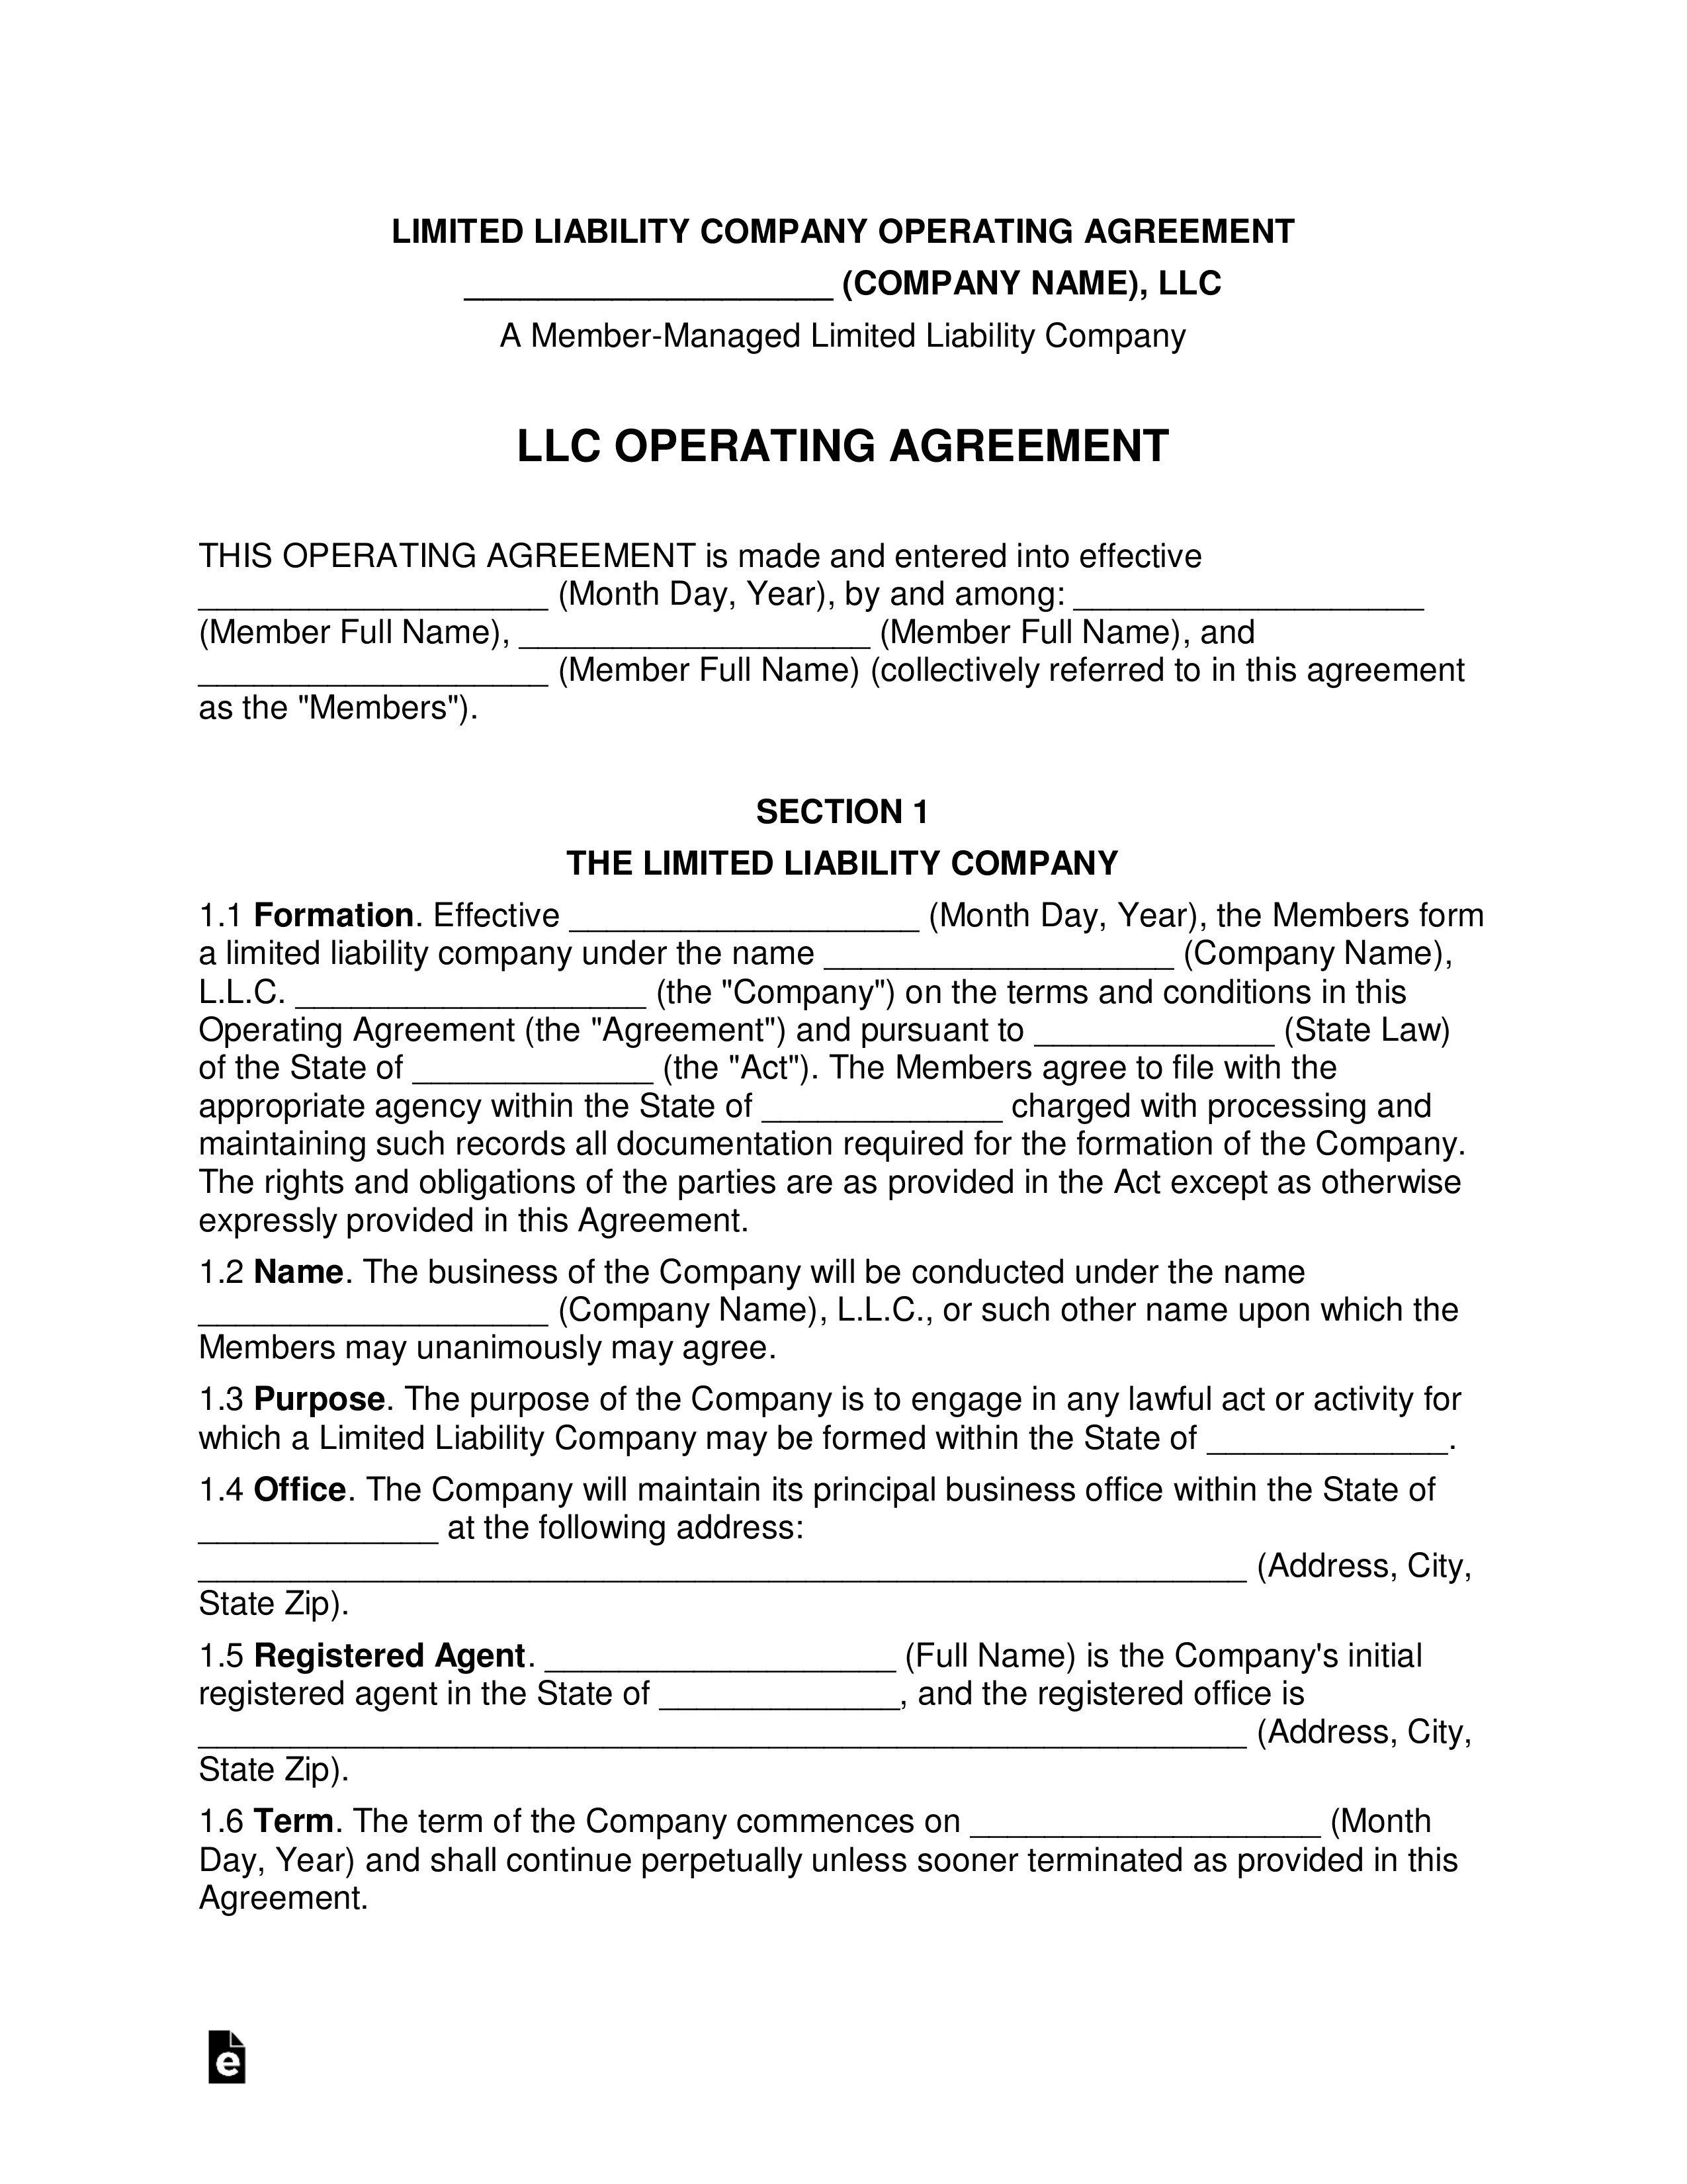 007 Rare Llc Operating Agreement Template Free Photo  Single Member Pdf Simple DownloadFull